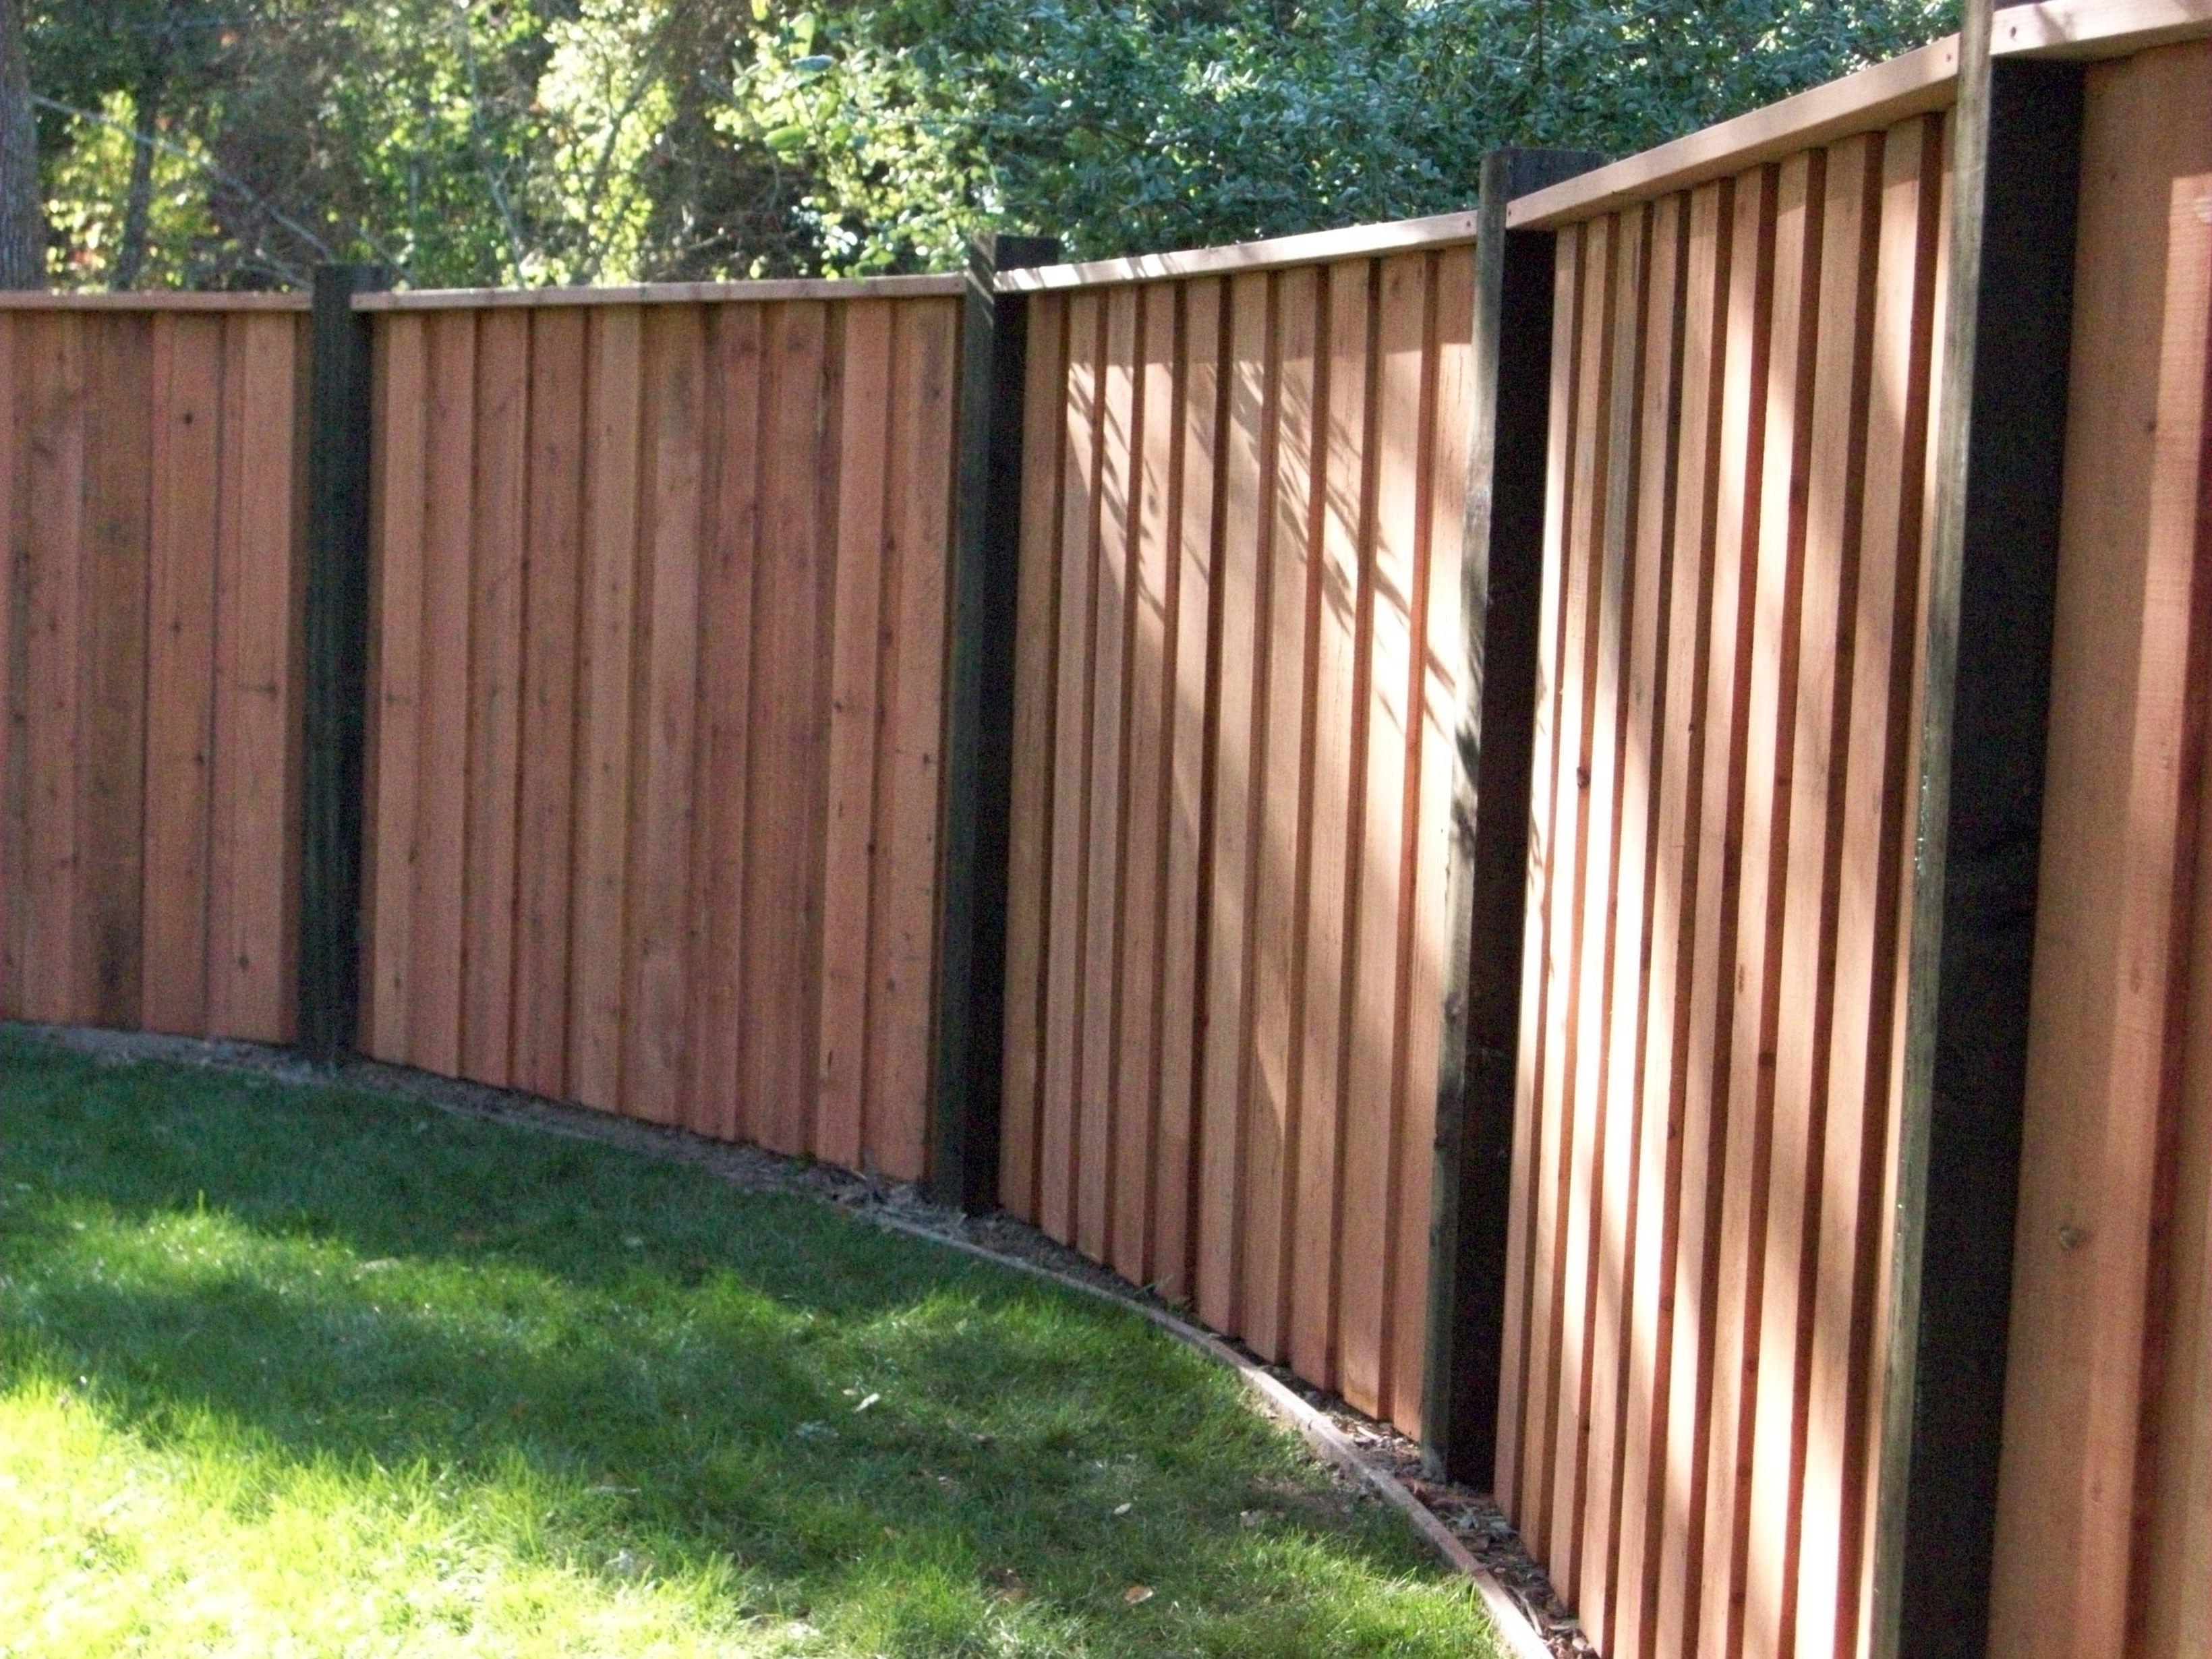 Board on board fence solid wood fences pinterest wood fences board on board fence baanklon Gallery